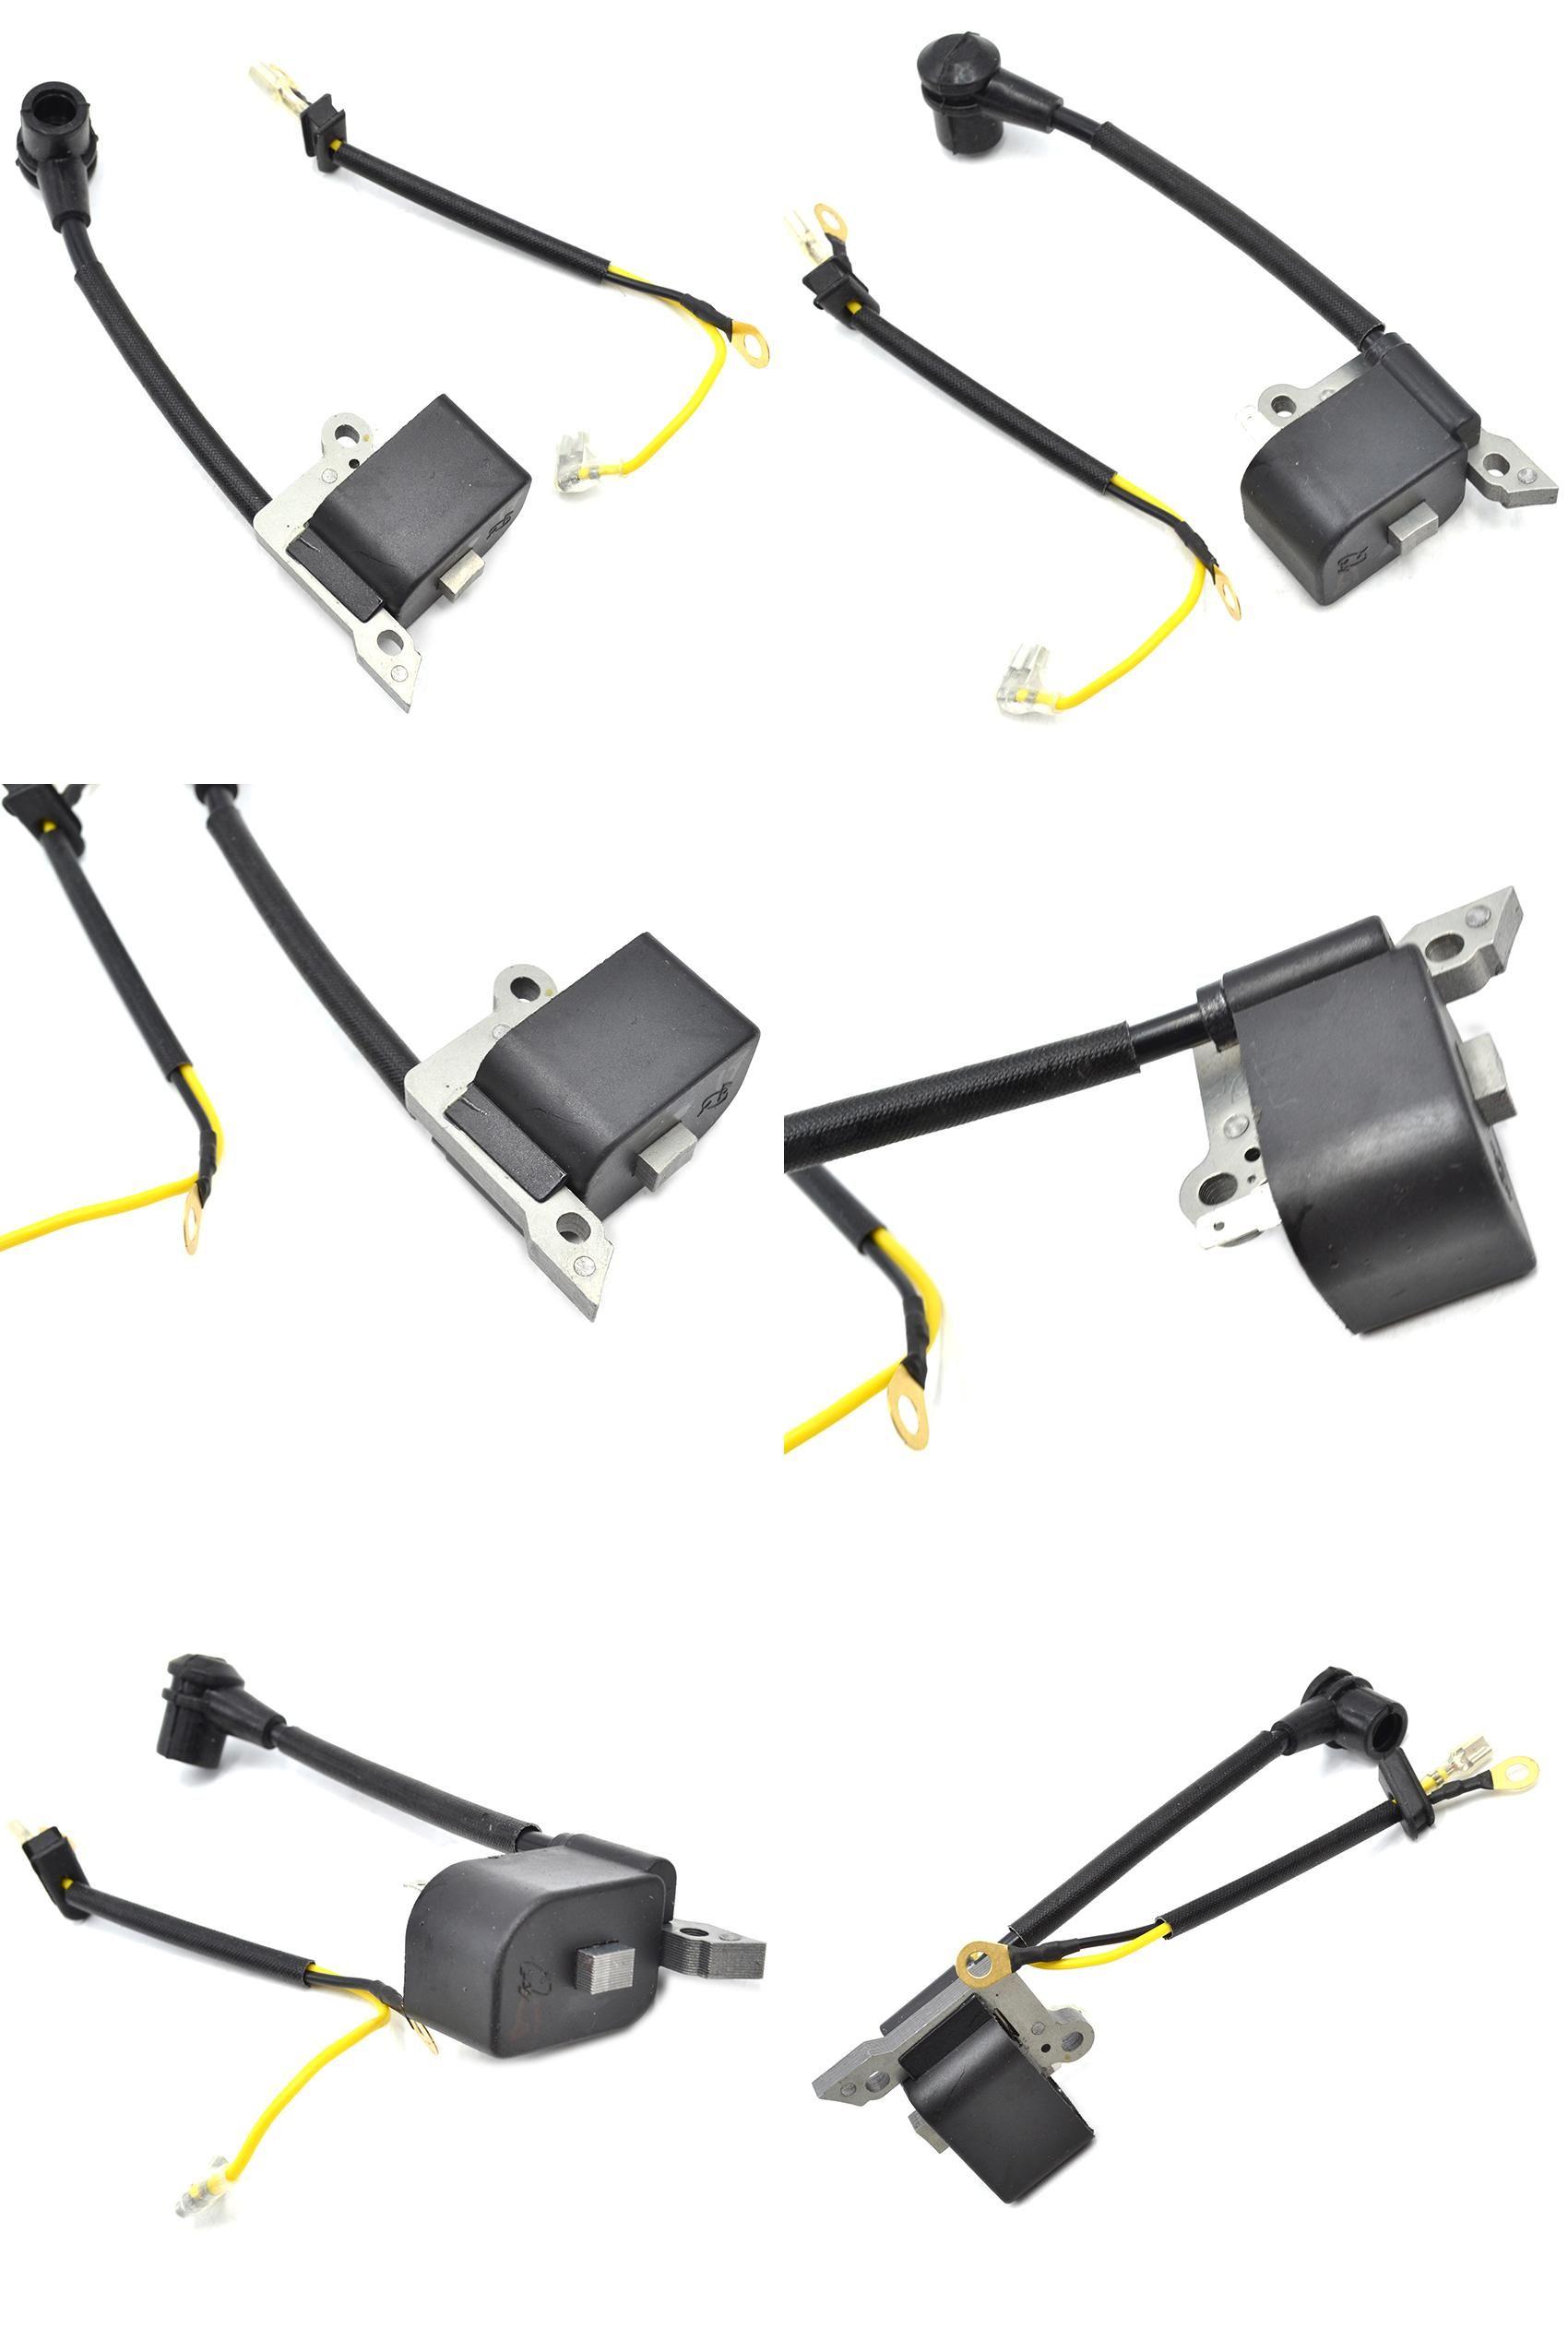 visit to buy] chainsaw module ignition coil wire kit for husqvarna husqvarna 350 fuel line diagram  husqvarna 141 parts diagram